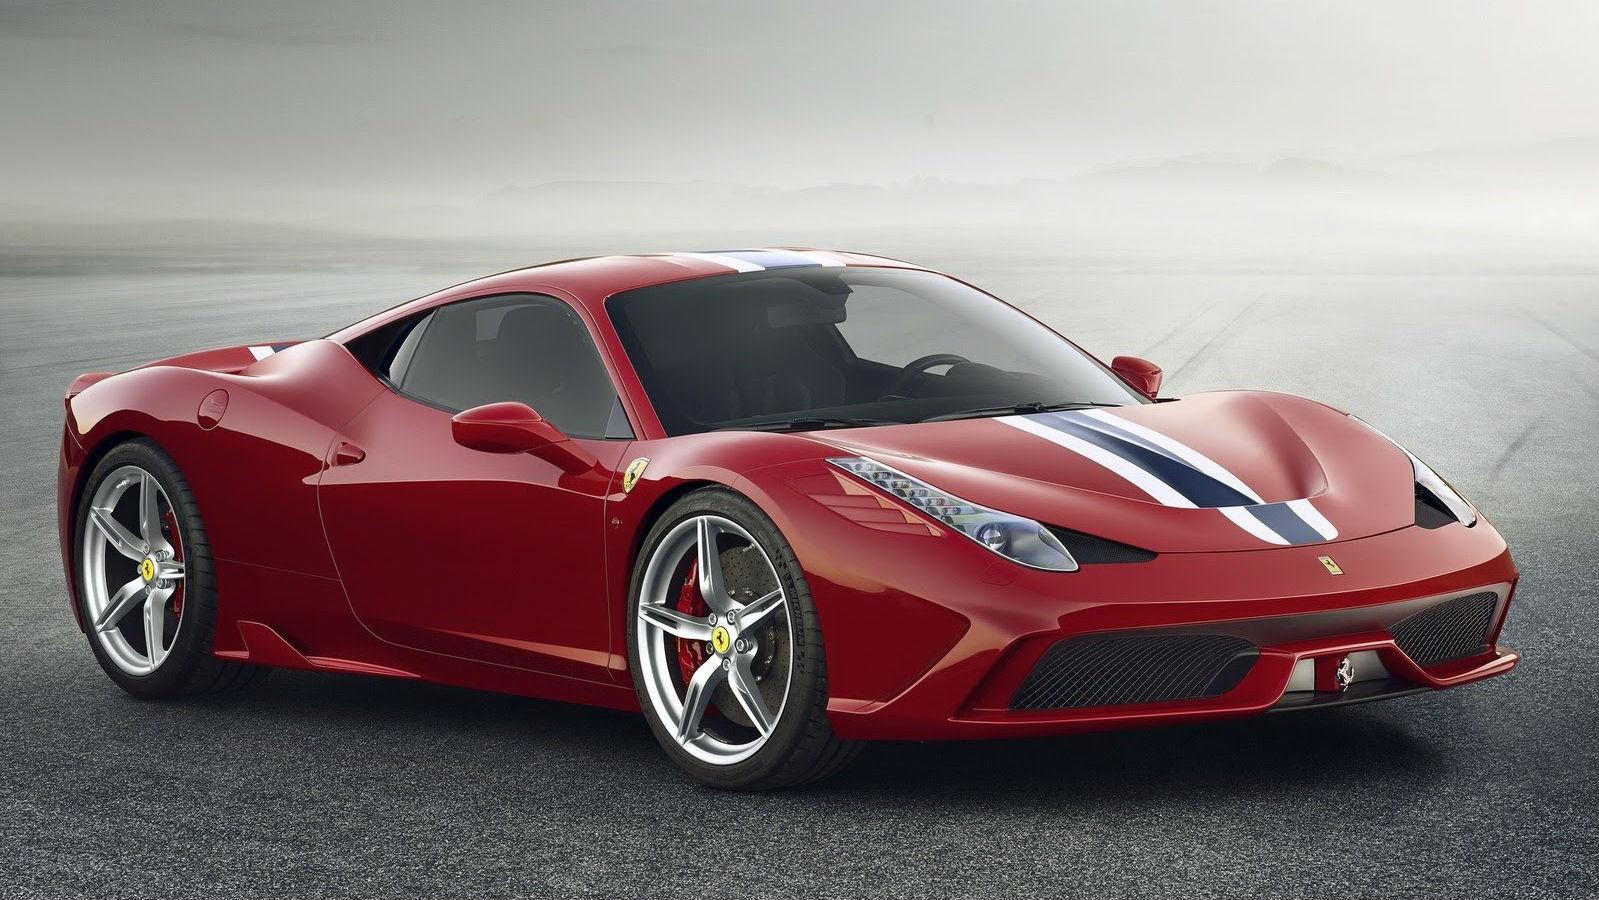 Ferrari 458 Speciale To Debut At Frankfurt